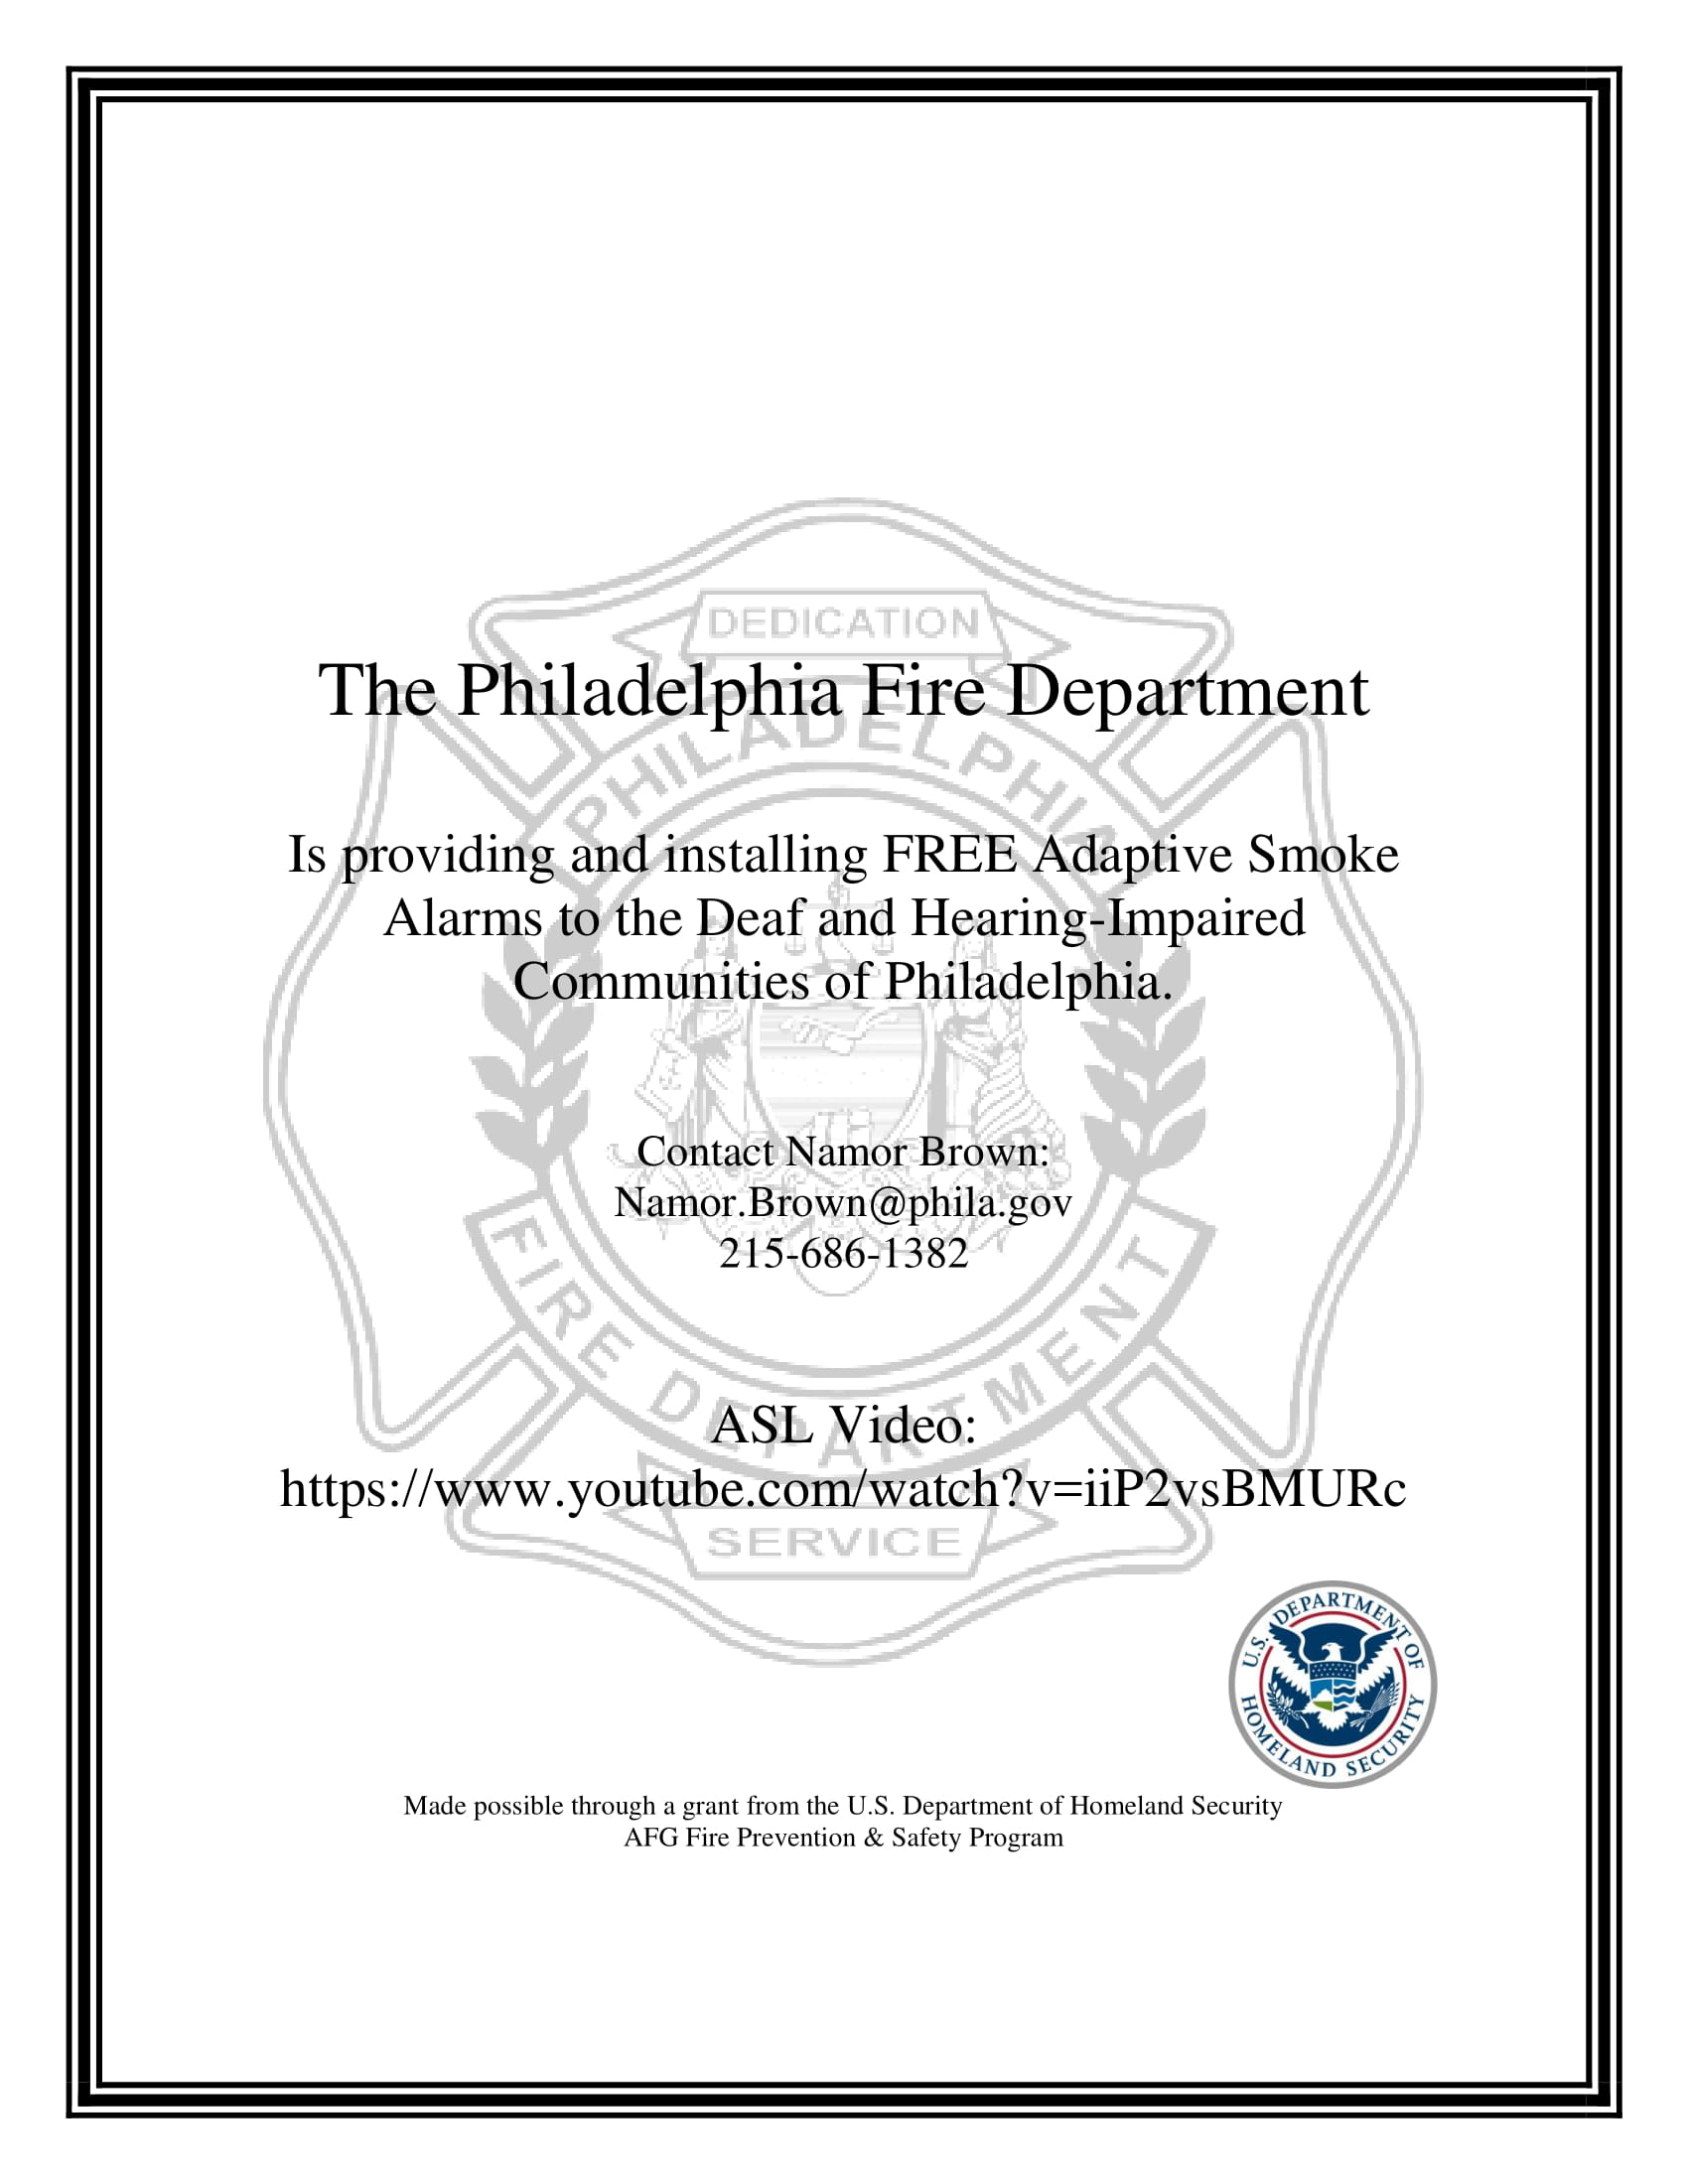 Philadelphia Fire Department Installing Adaptive Smoke